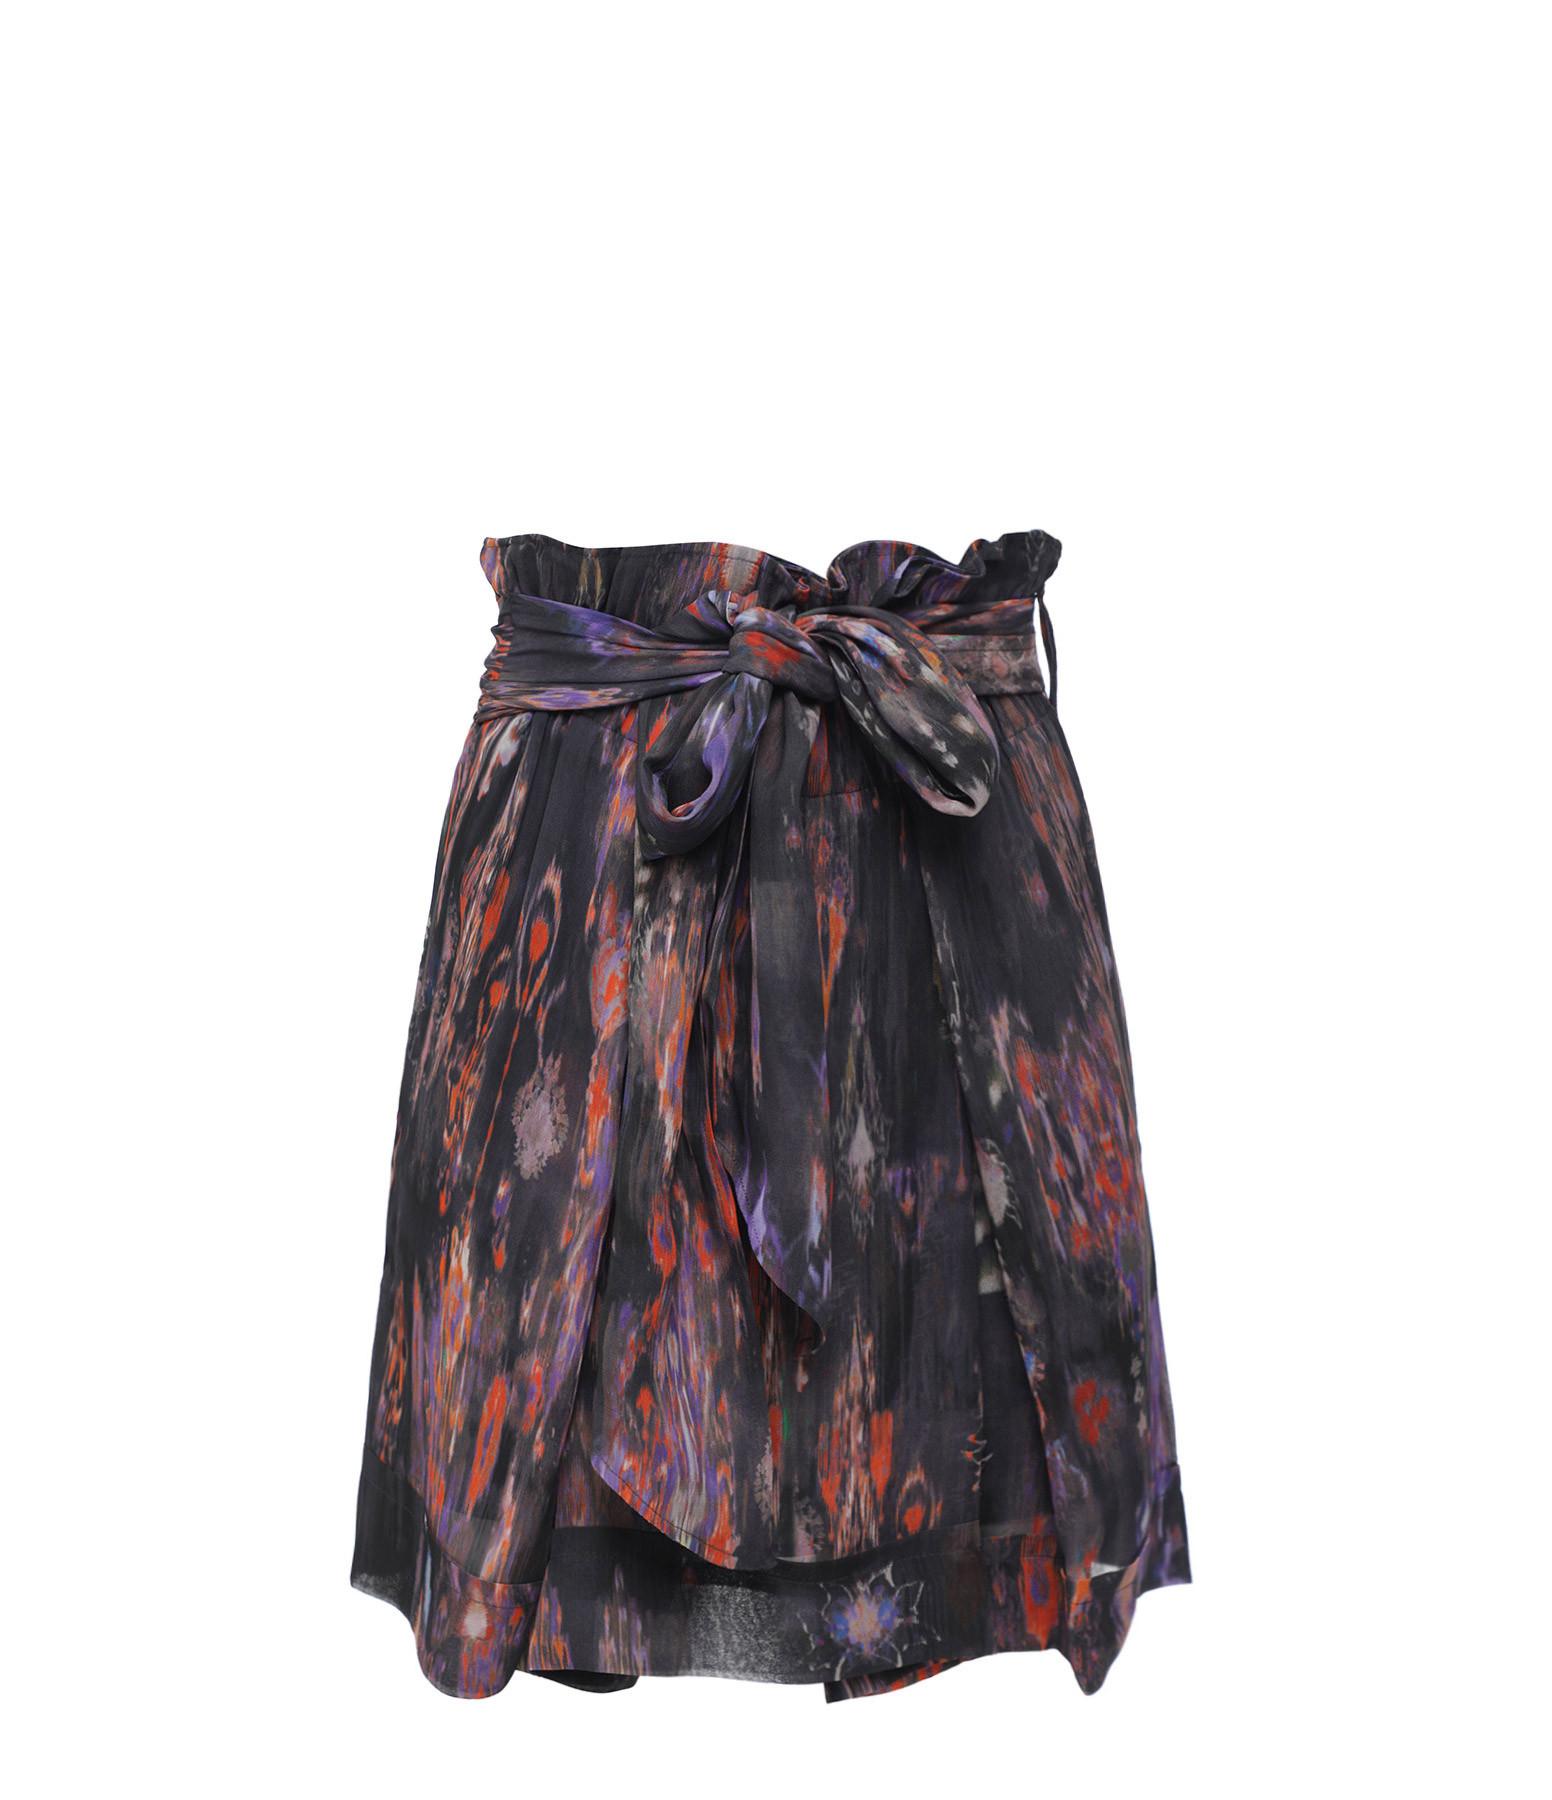 IRO - Jupe Joee Noir Multicolore